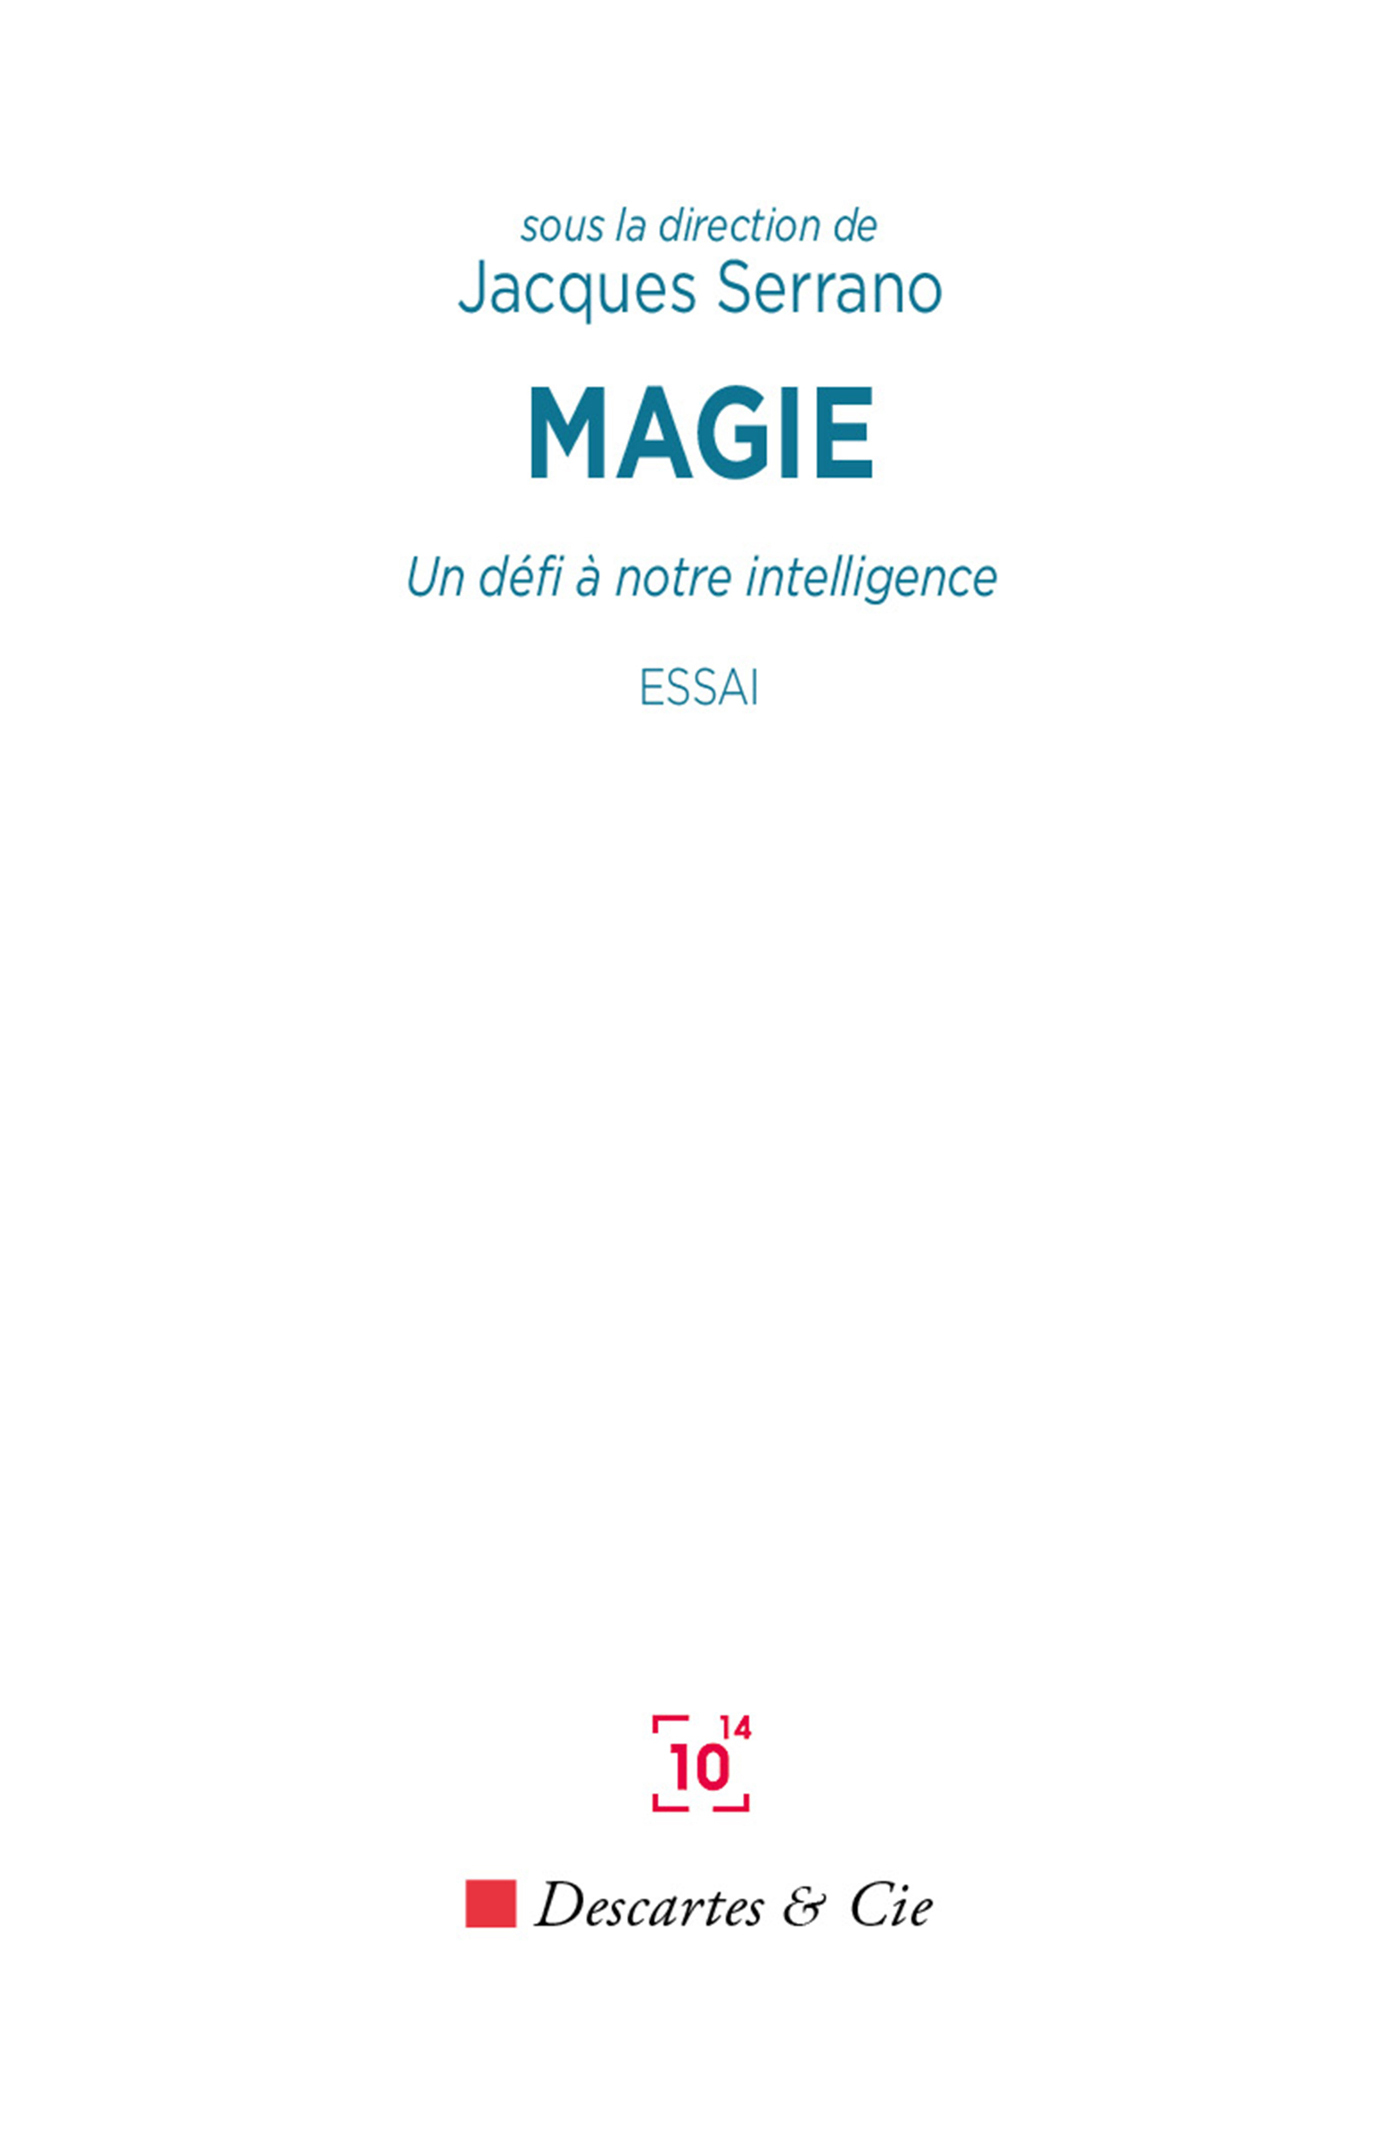 MAGIE - UN DEFI A NOTRE INTELLIGENCE